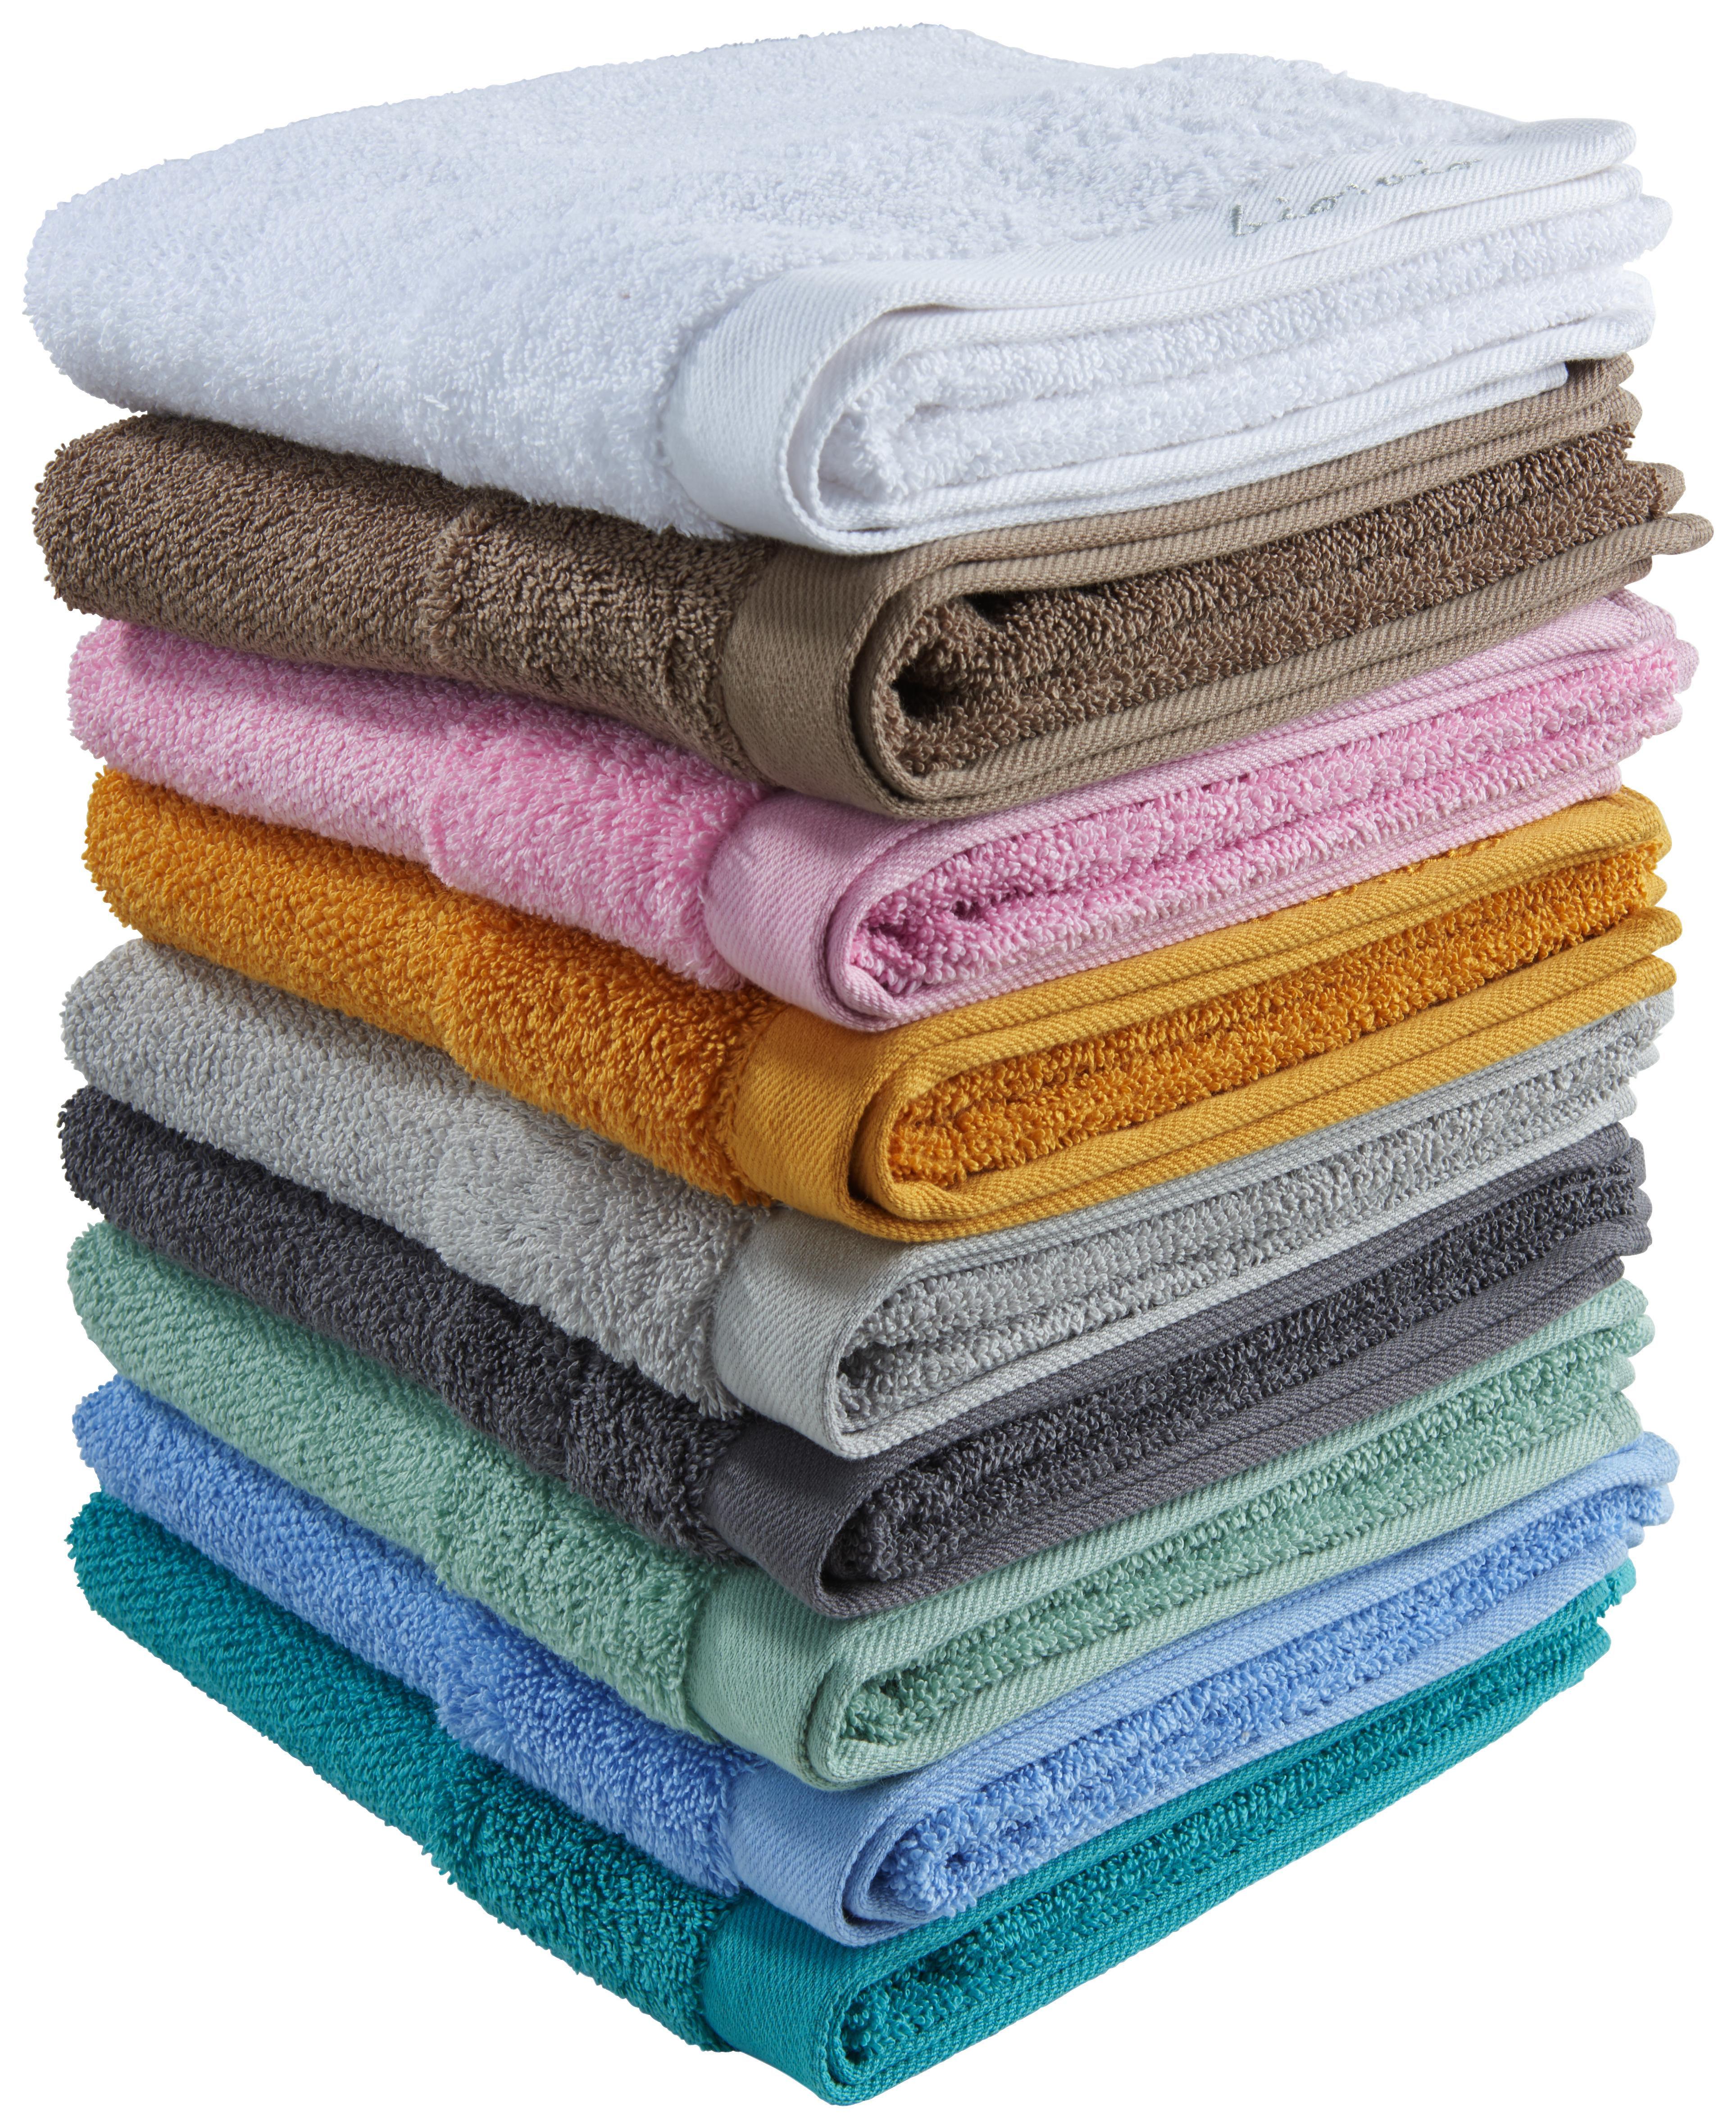 HANDDUK - turkos, Natur, textil (50/100cm) - Bio:Vio